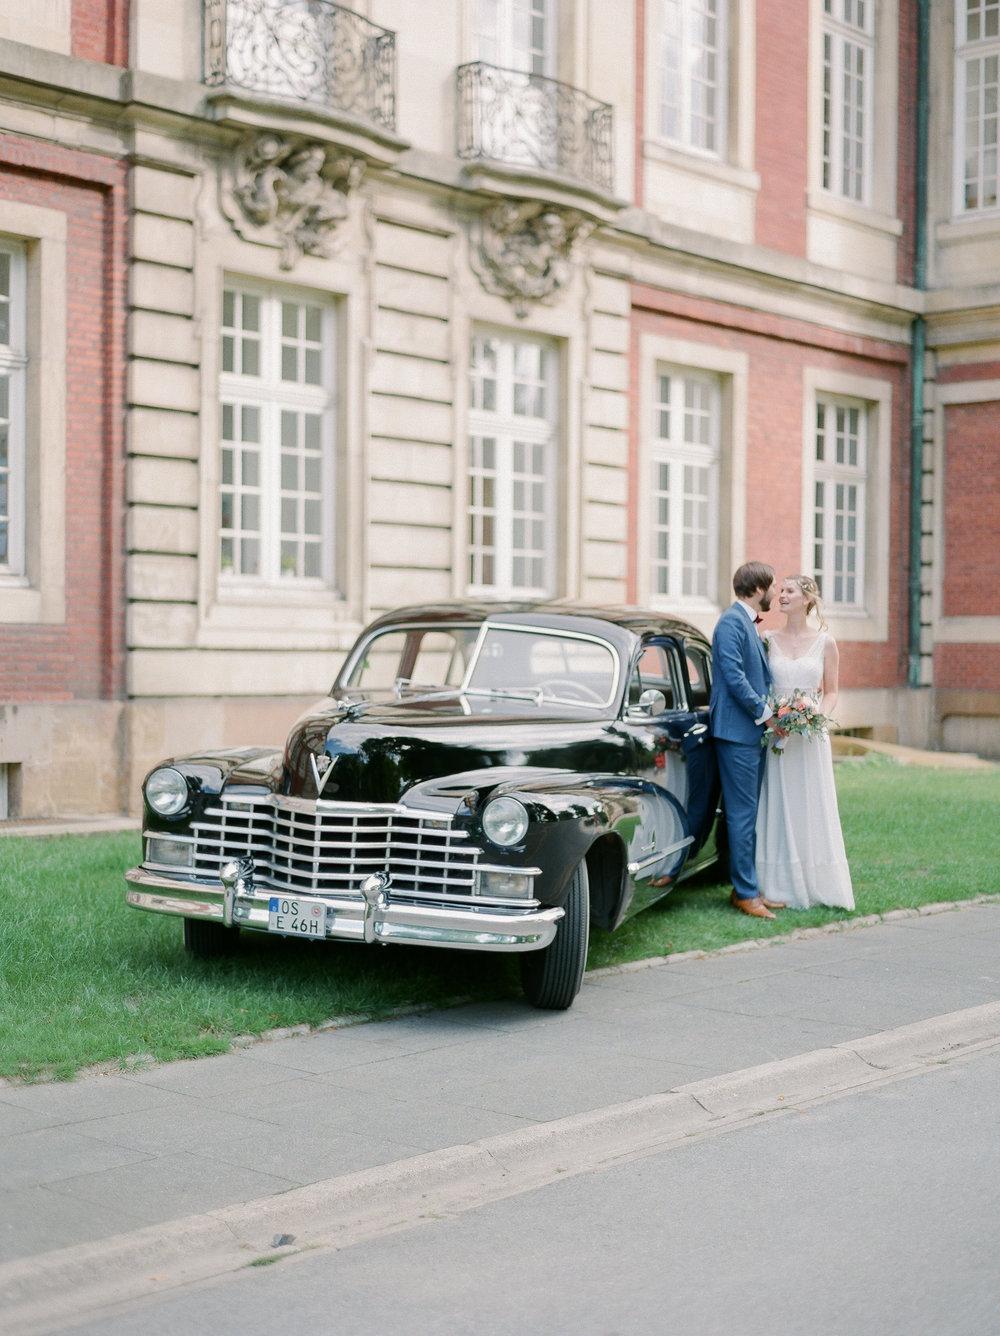 Urban Muenster Wedding - COMING SOON